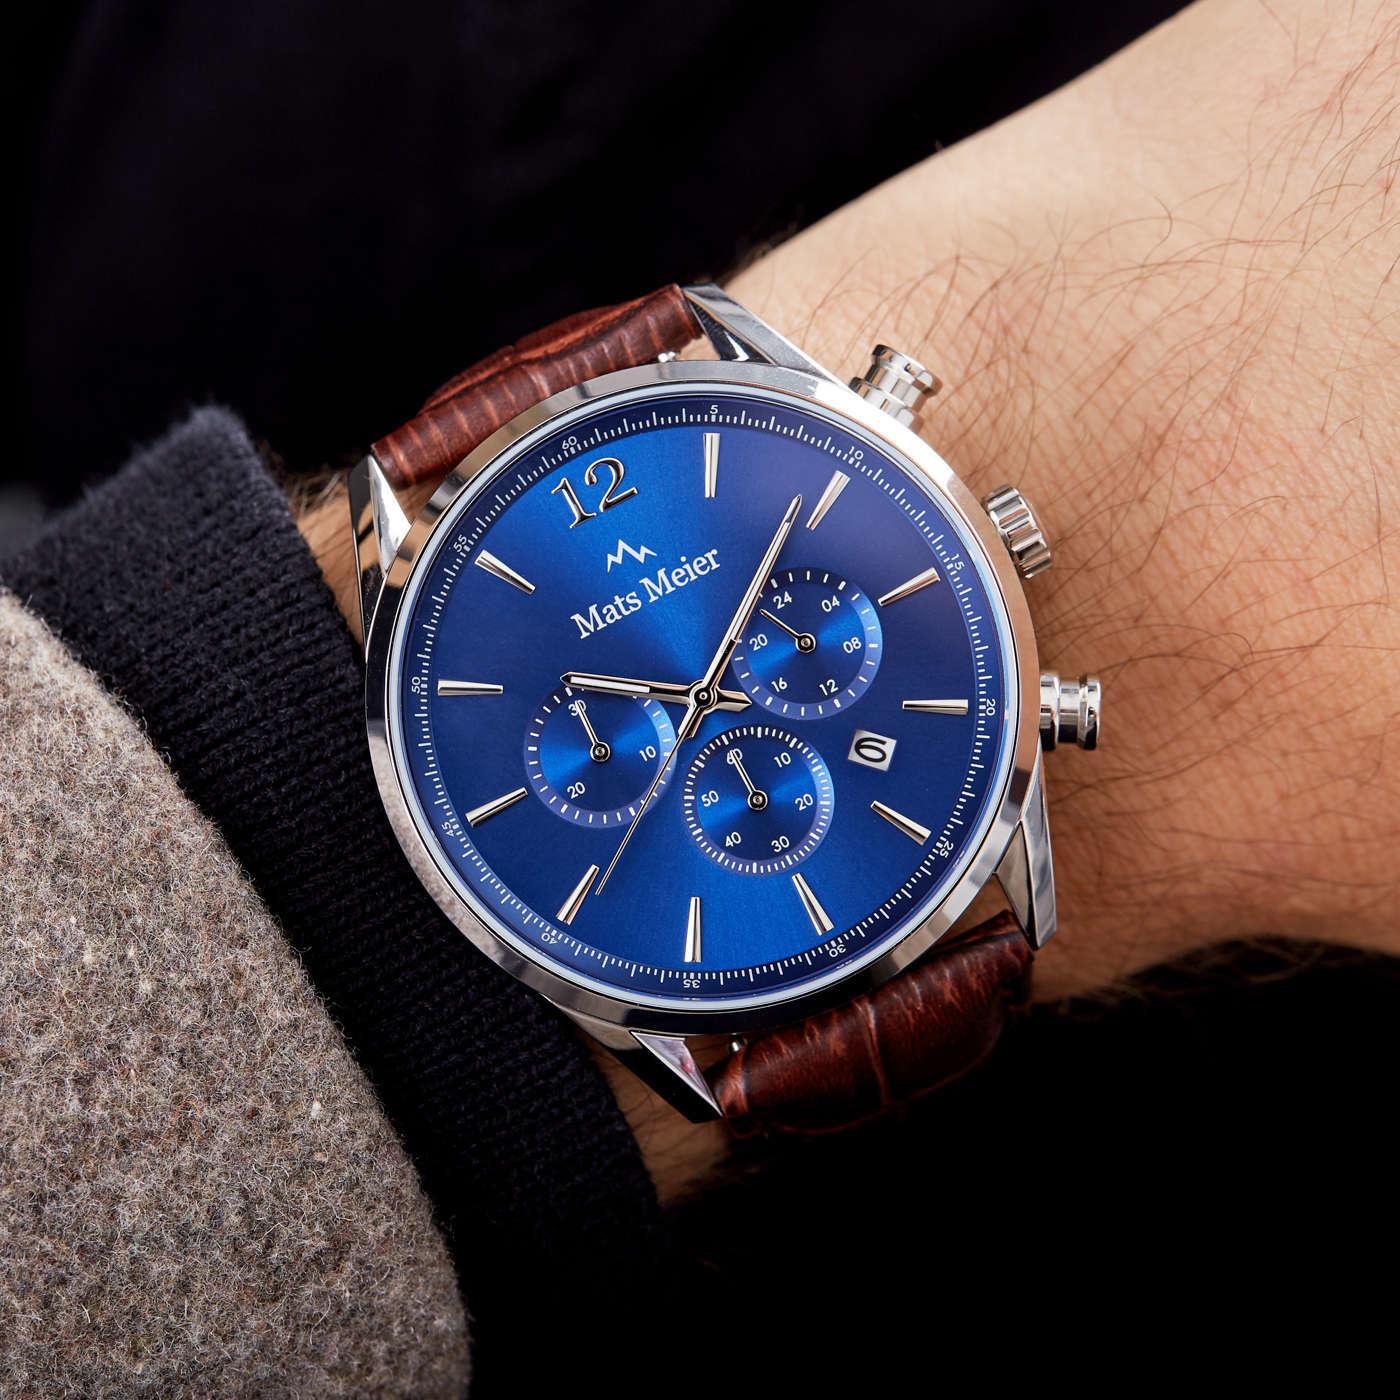 Mats Meier Grand Cornier chronograaf herenhorloge blauw / bruin